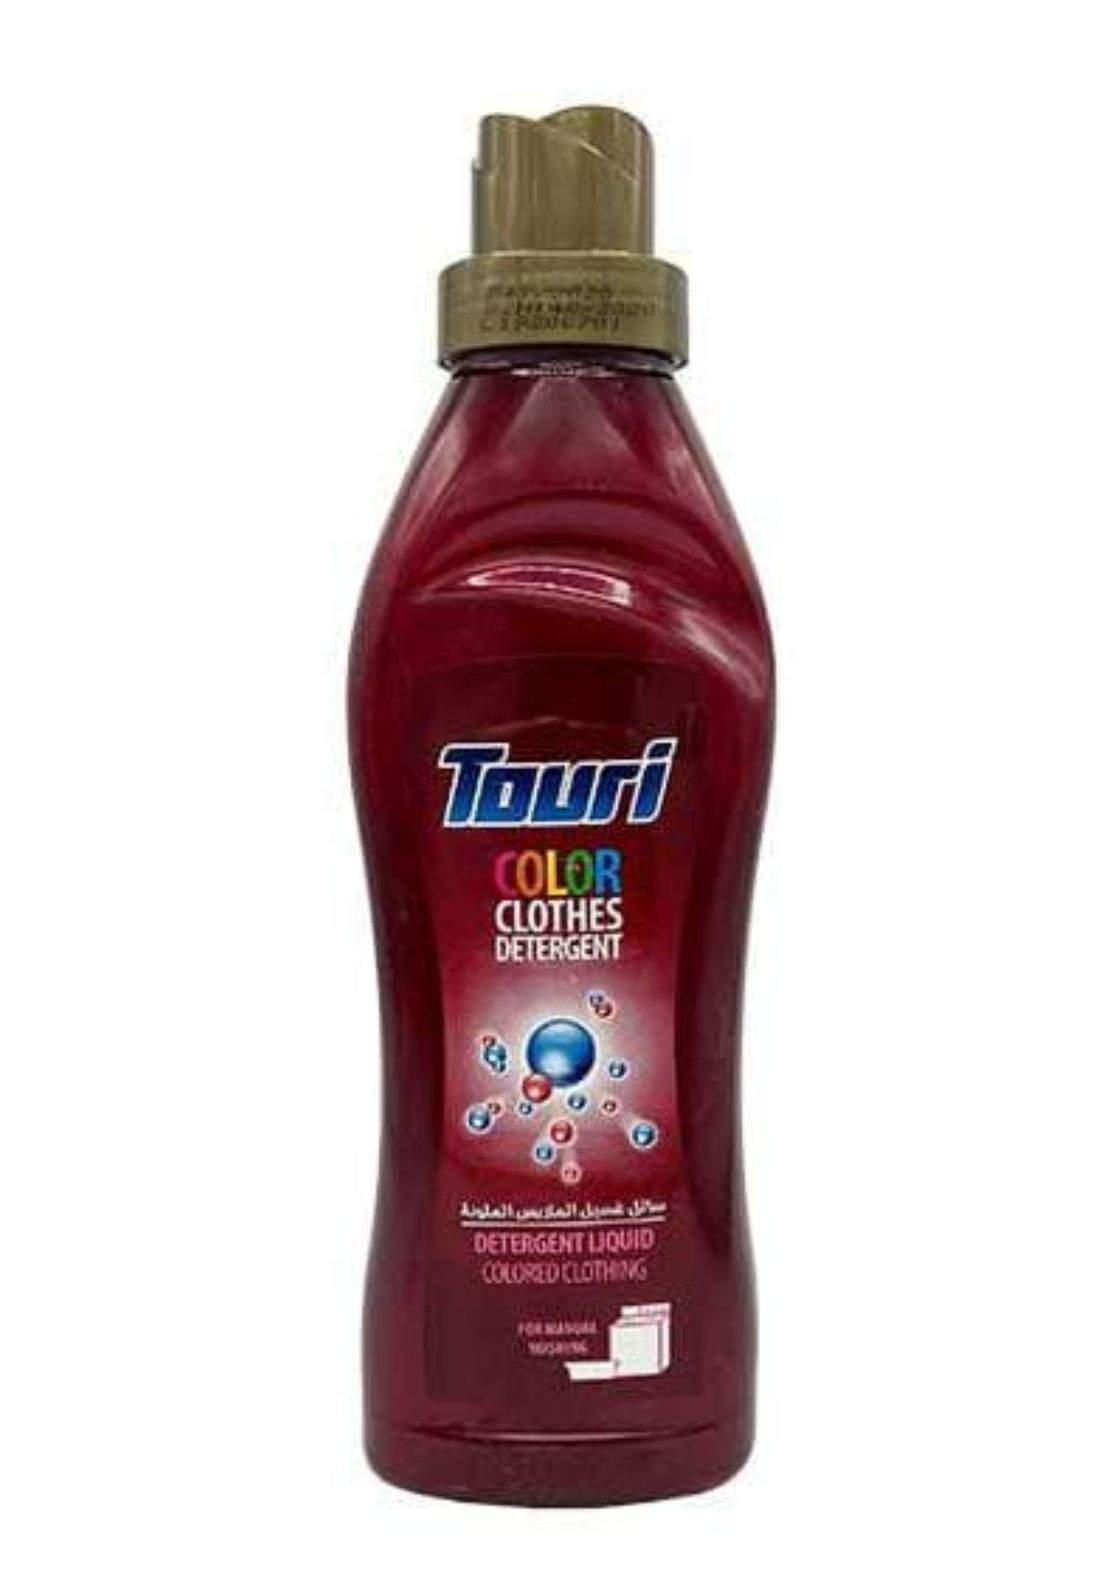 Touri color clothes detergent 900ml طوري سائل غسيل الملابس الملوية